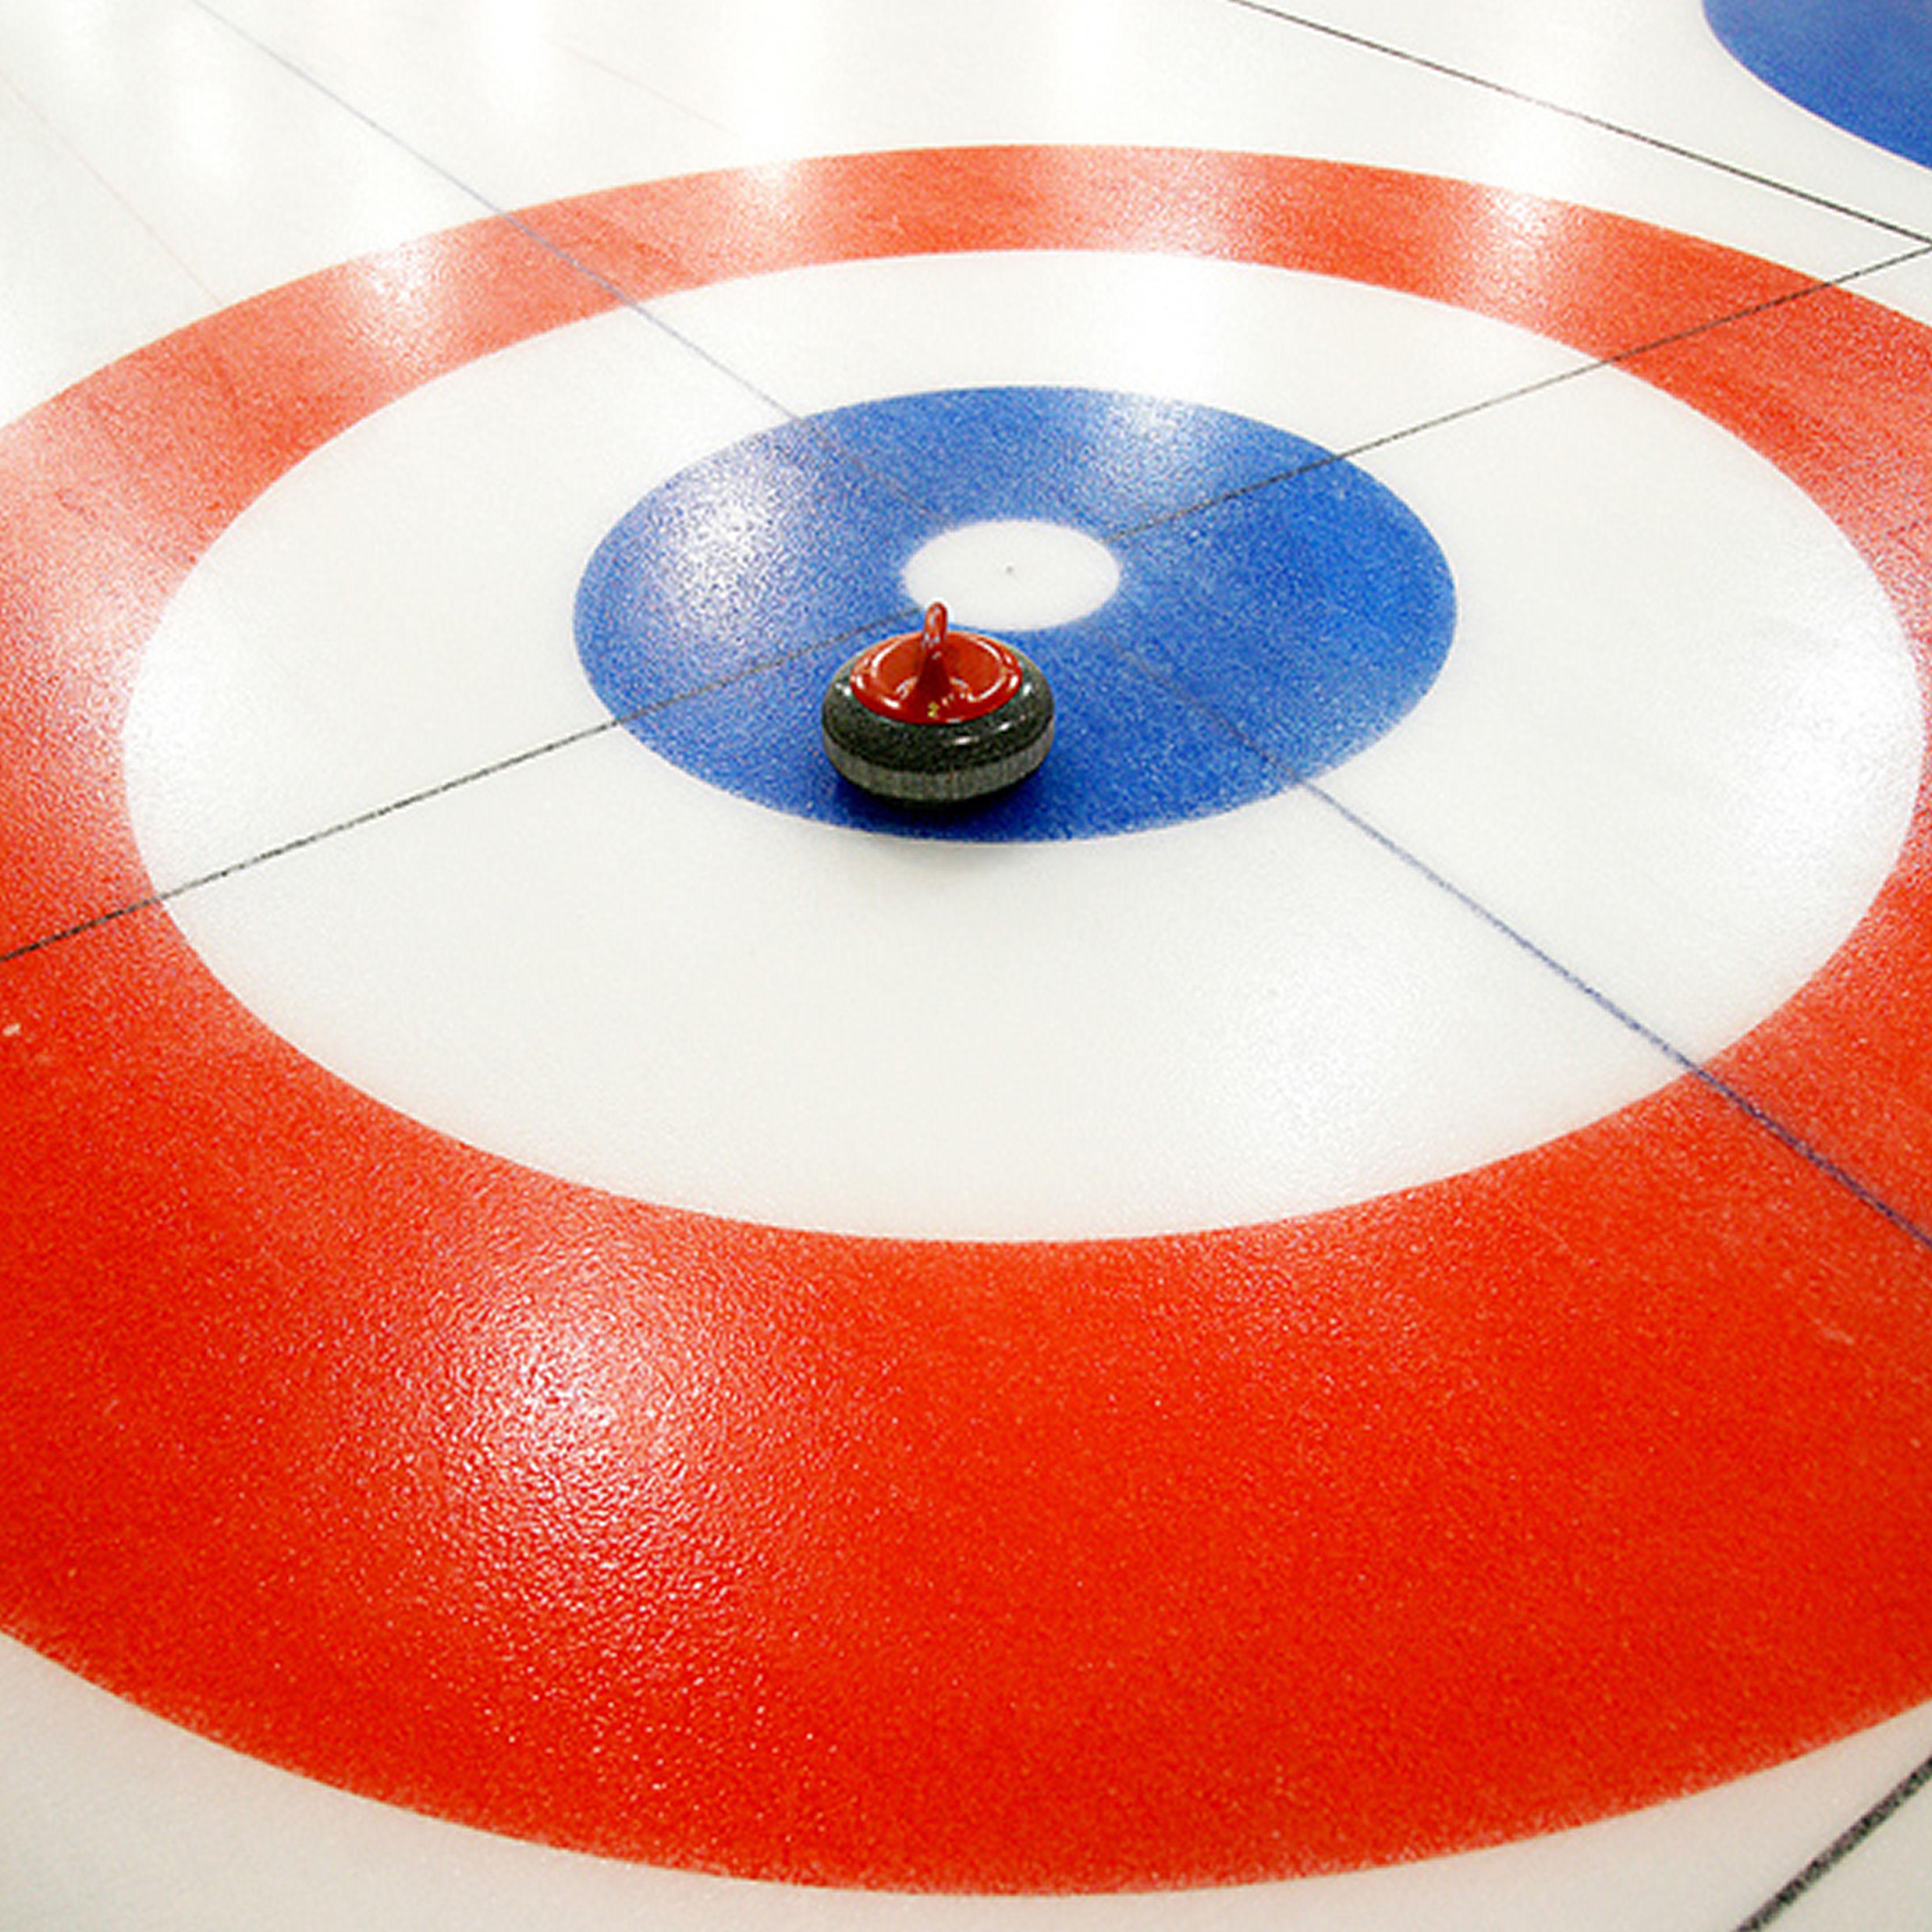 Curling is a Sport of Etiquette